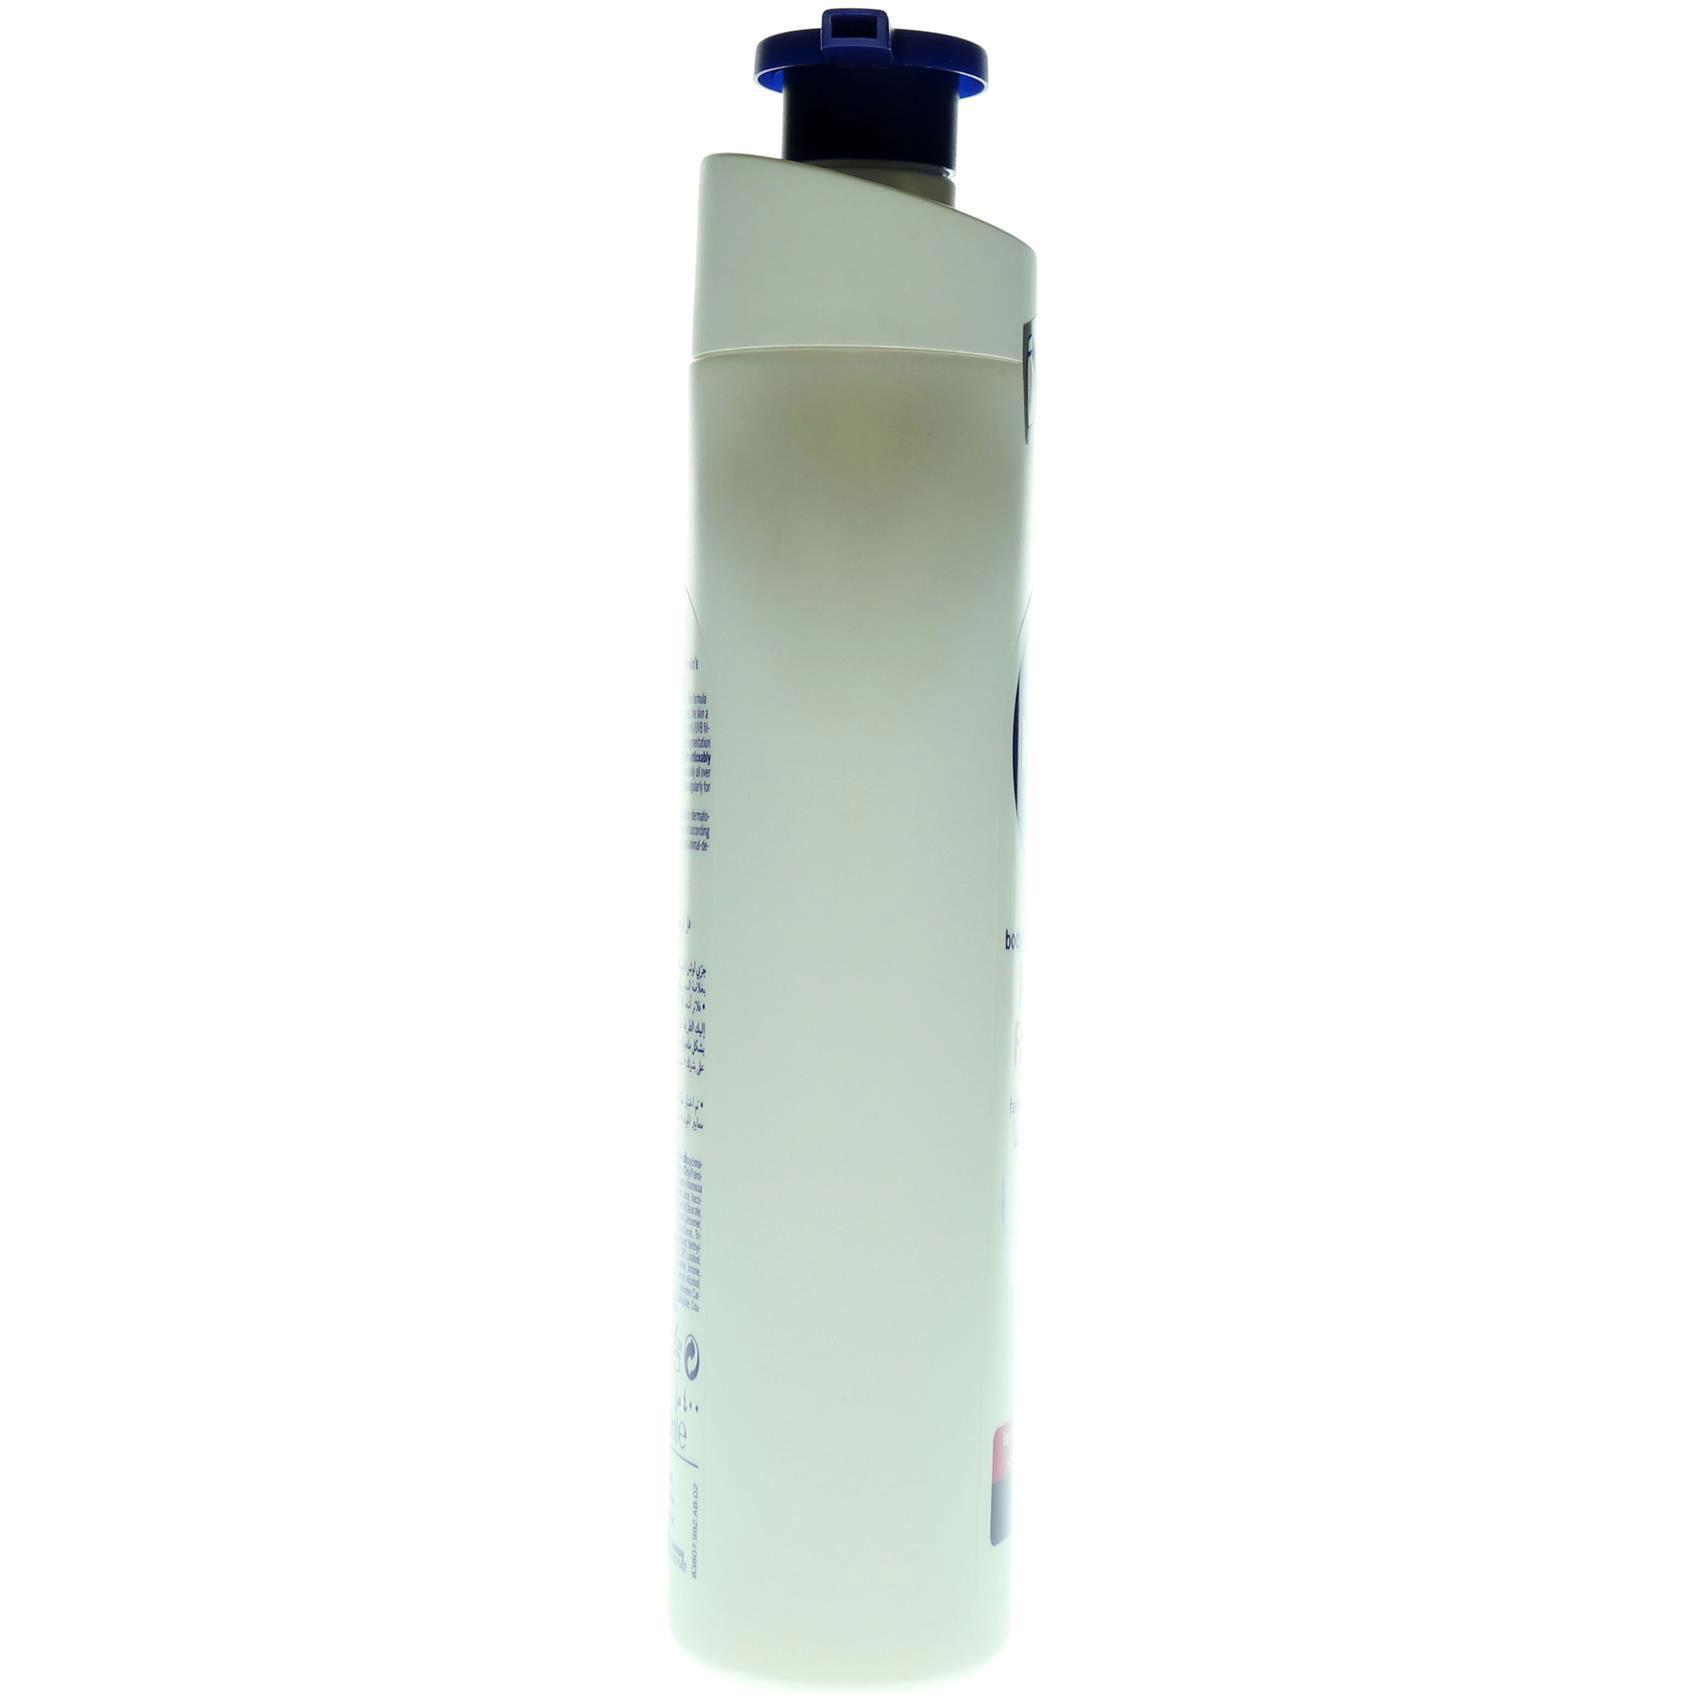 NIVEA WHITENING BODY LOTION 400ML